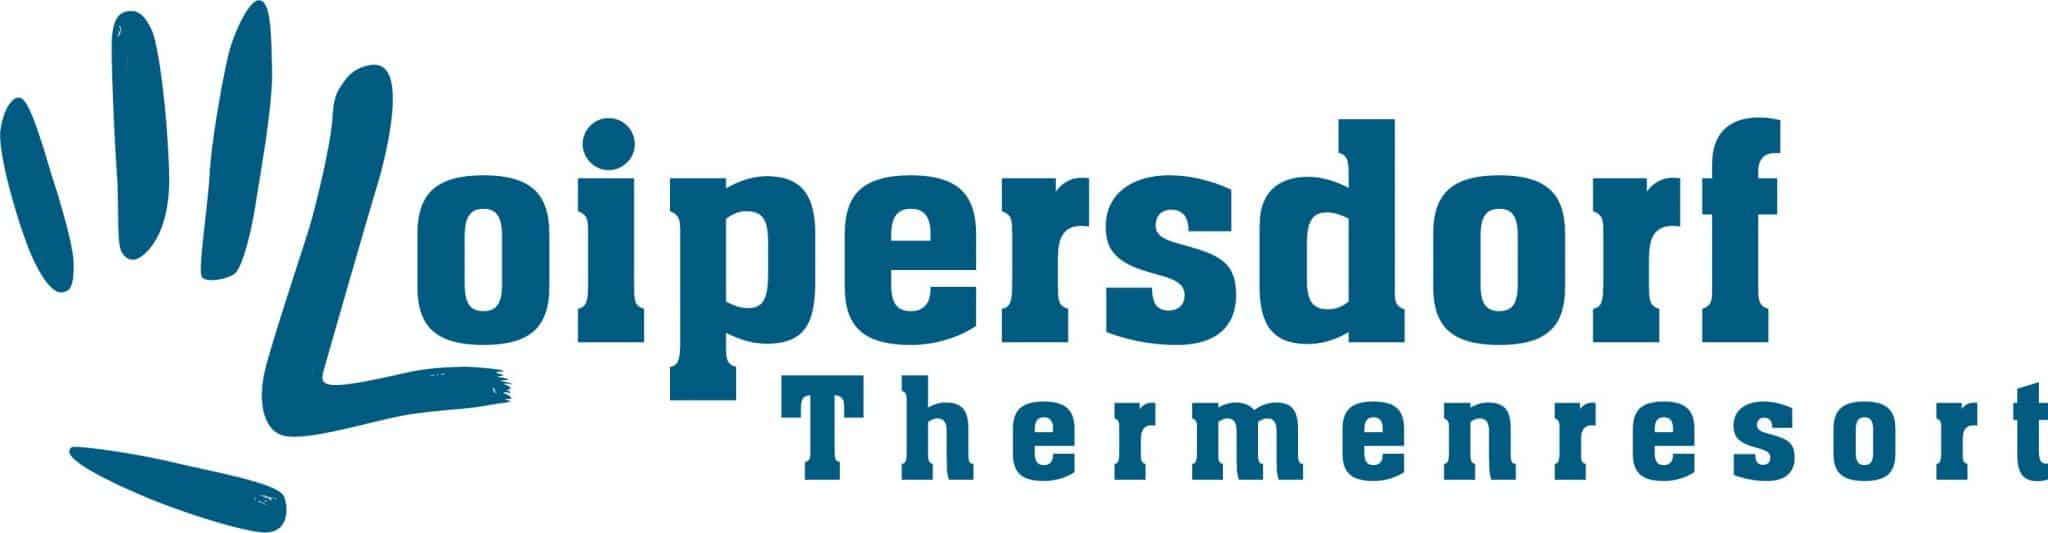 Thermenresort-Loipersdorf-Logo